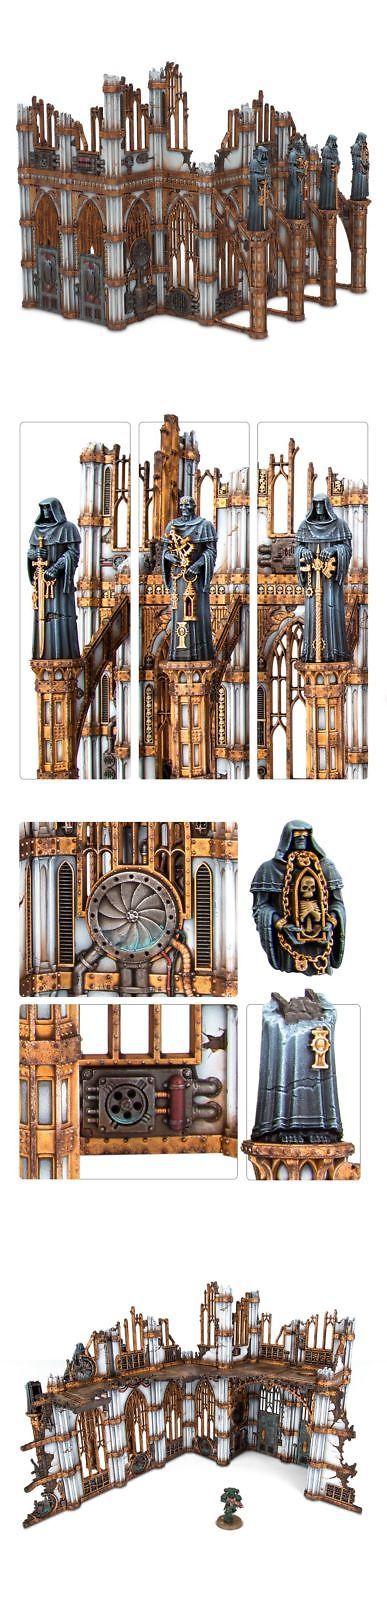 40K Terrain and Scenery 152940: Warhammer 40,000 40K Sector